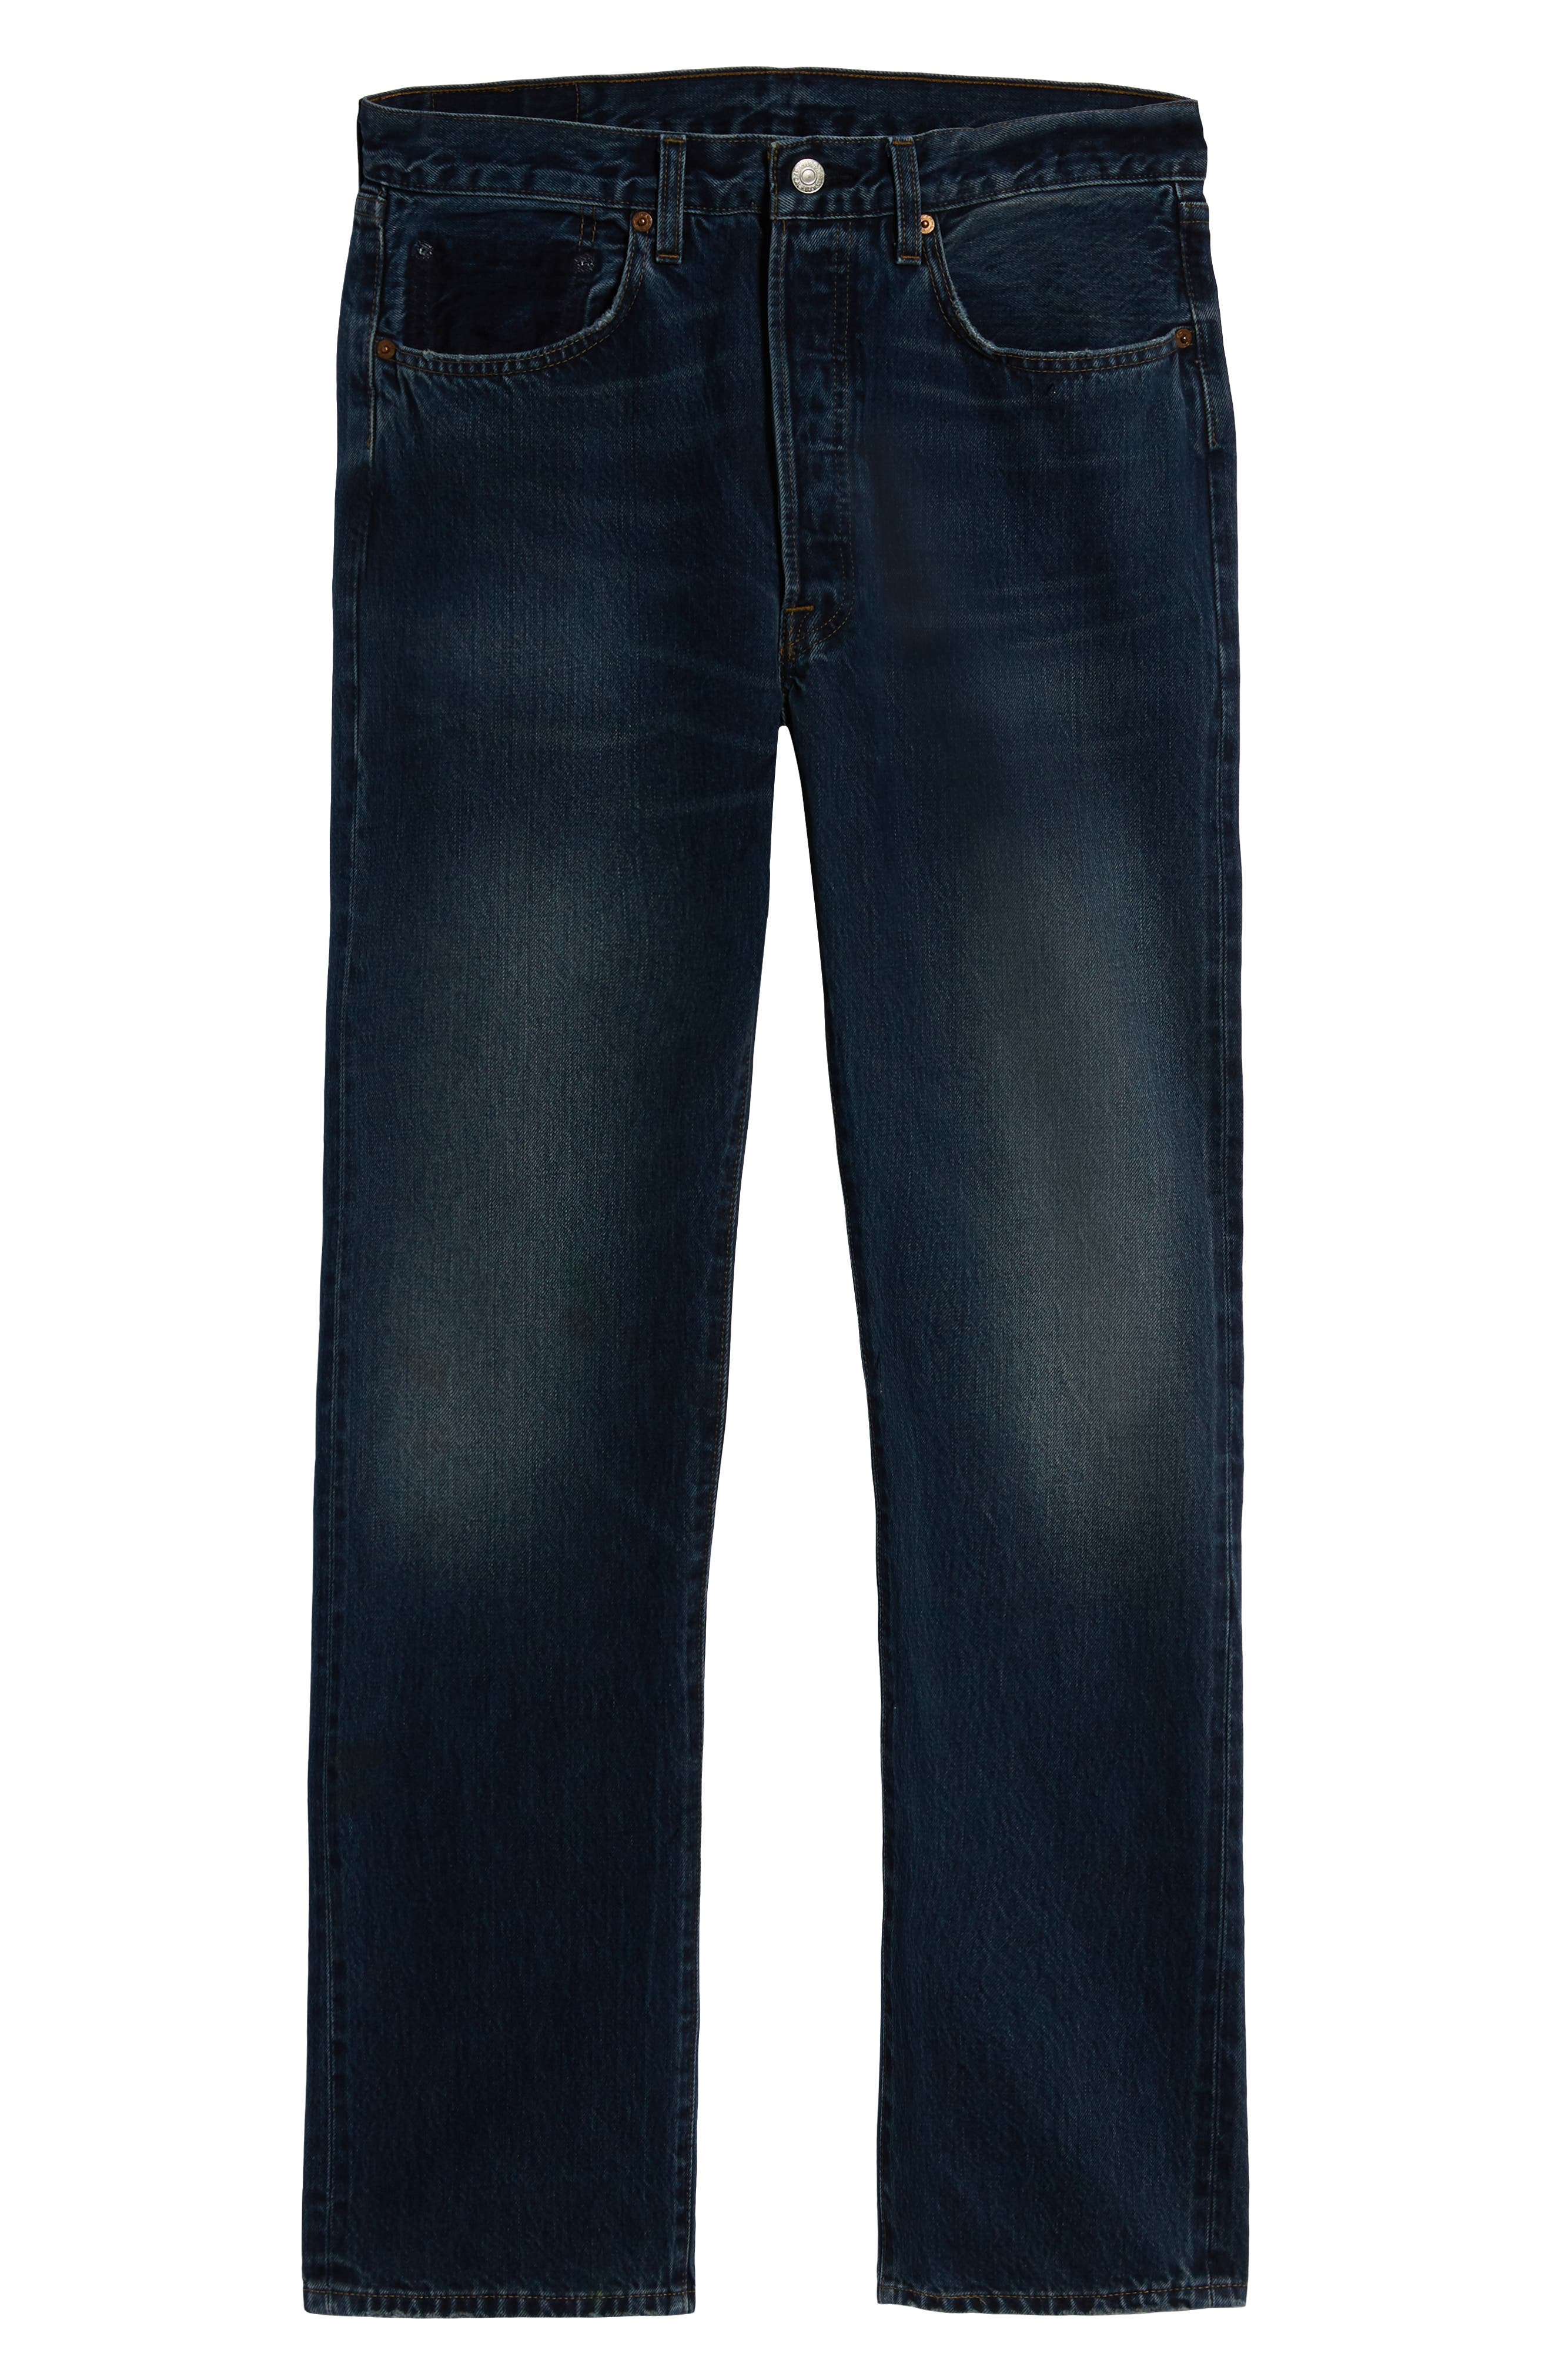 Levi's<sup>®</sup> 1967 501<sup>®</sup> Slim Fit Jeans,                             Alternate thumbnail 6, color,                             402